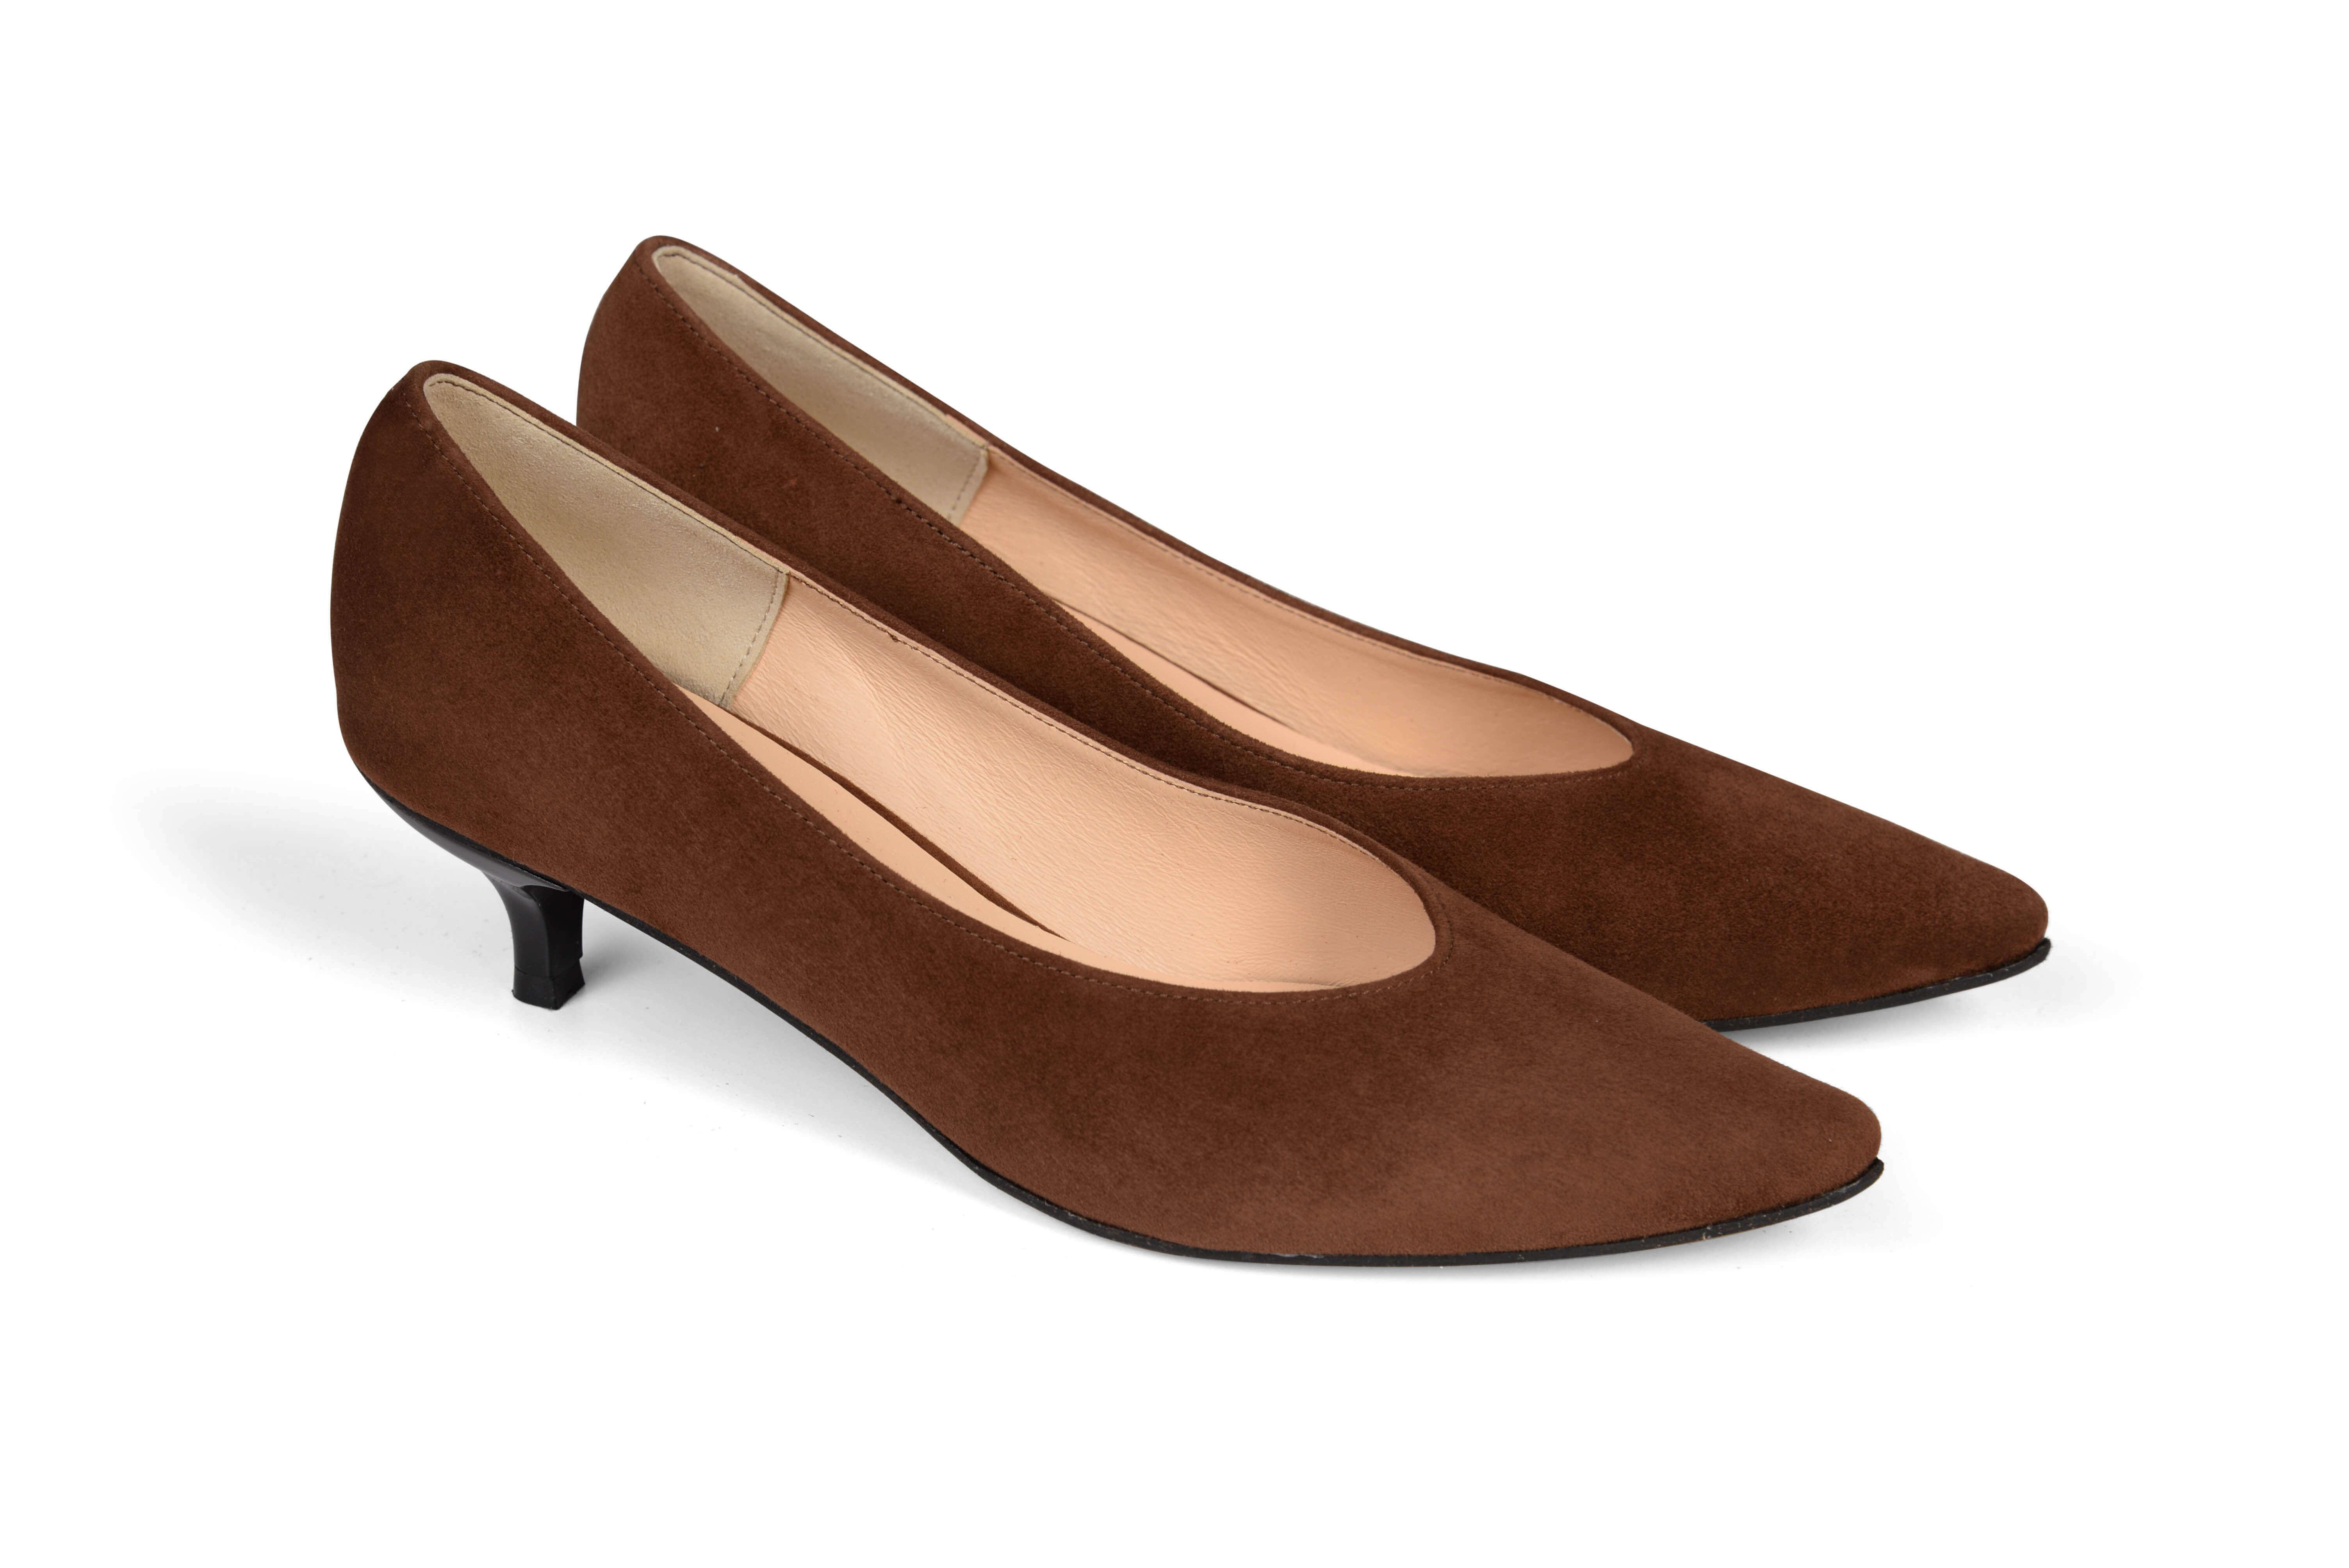 Kiki S pointed toe kitten heels - brown